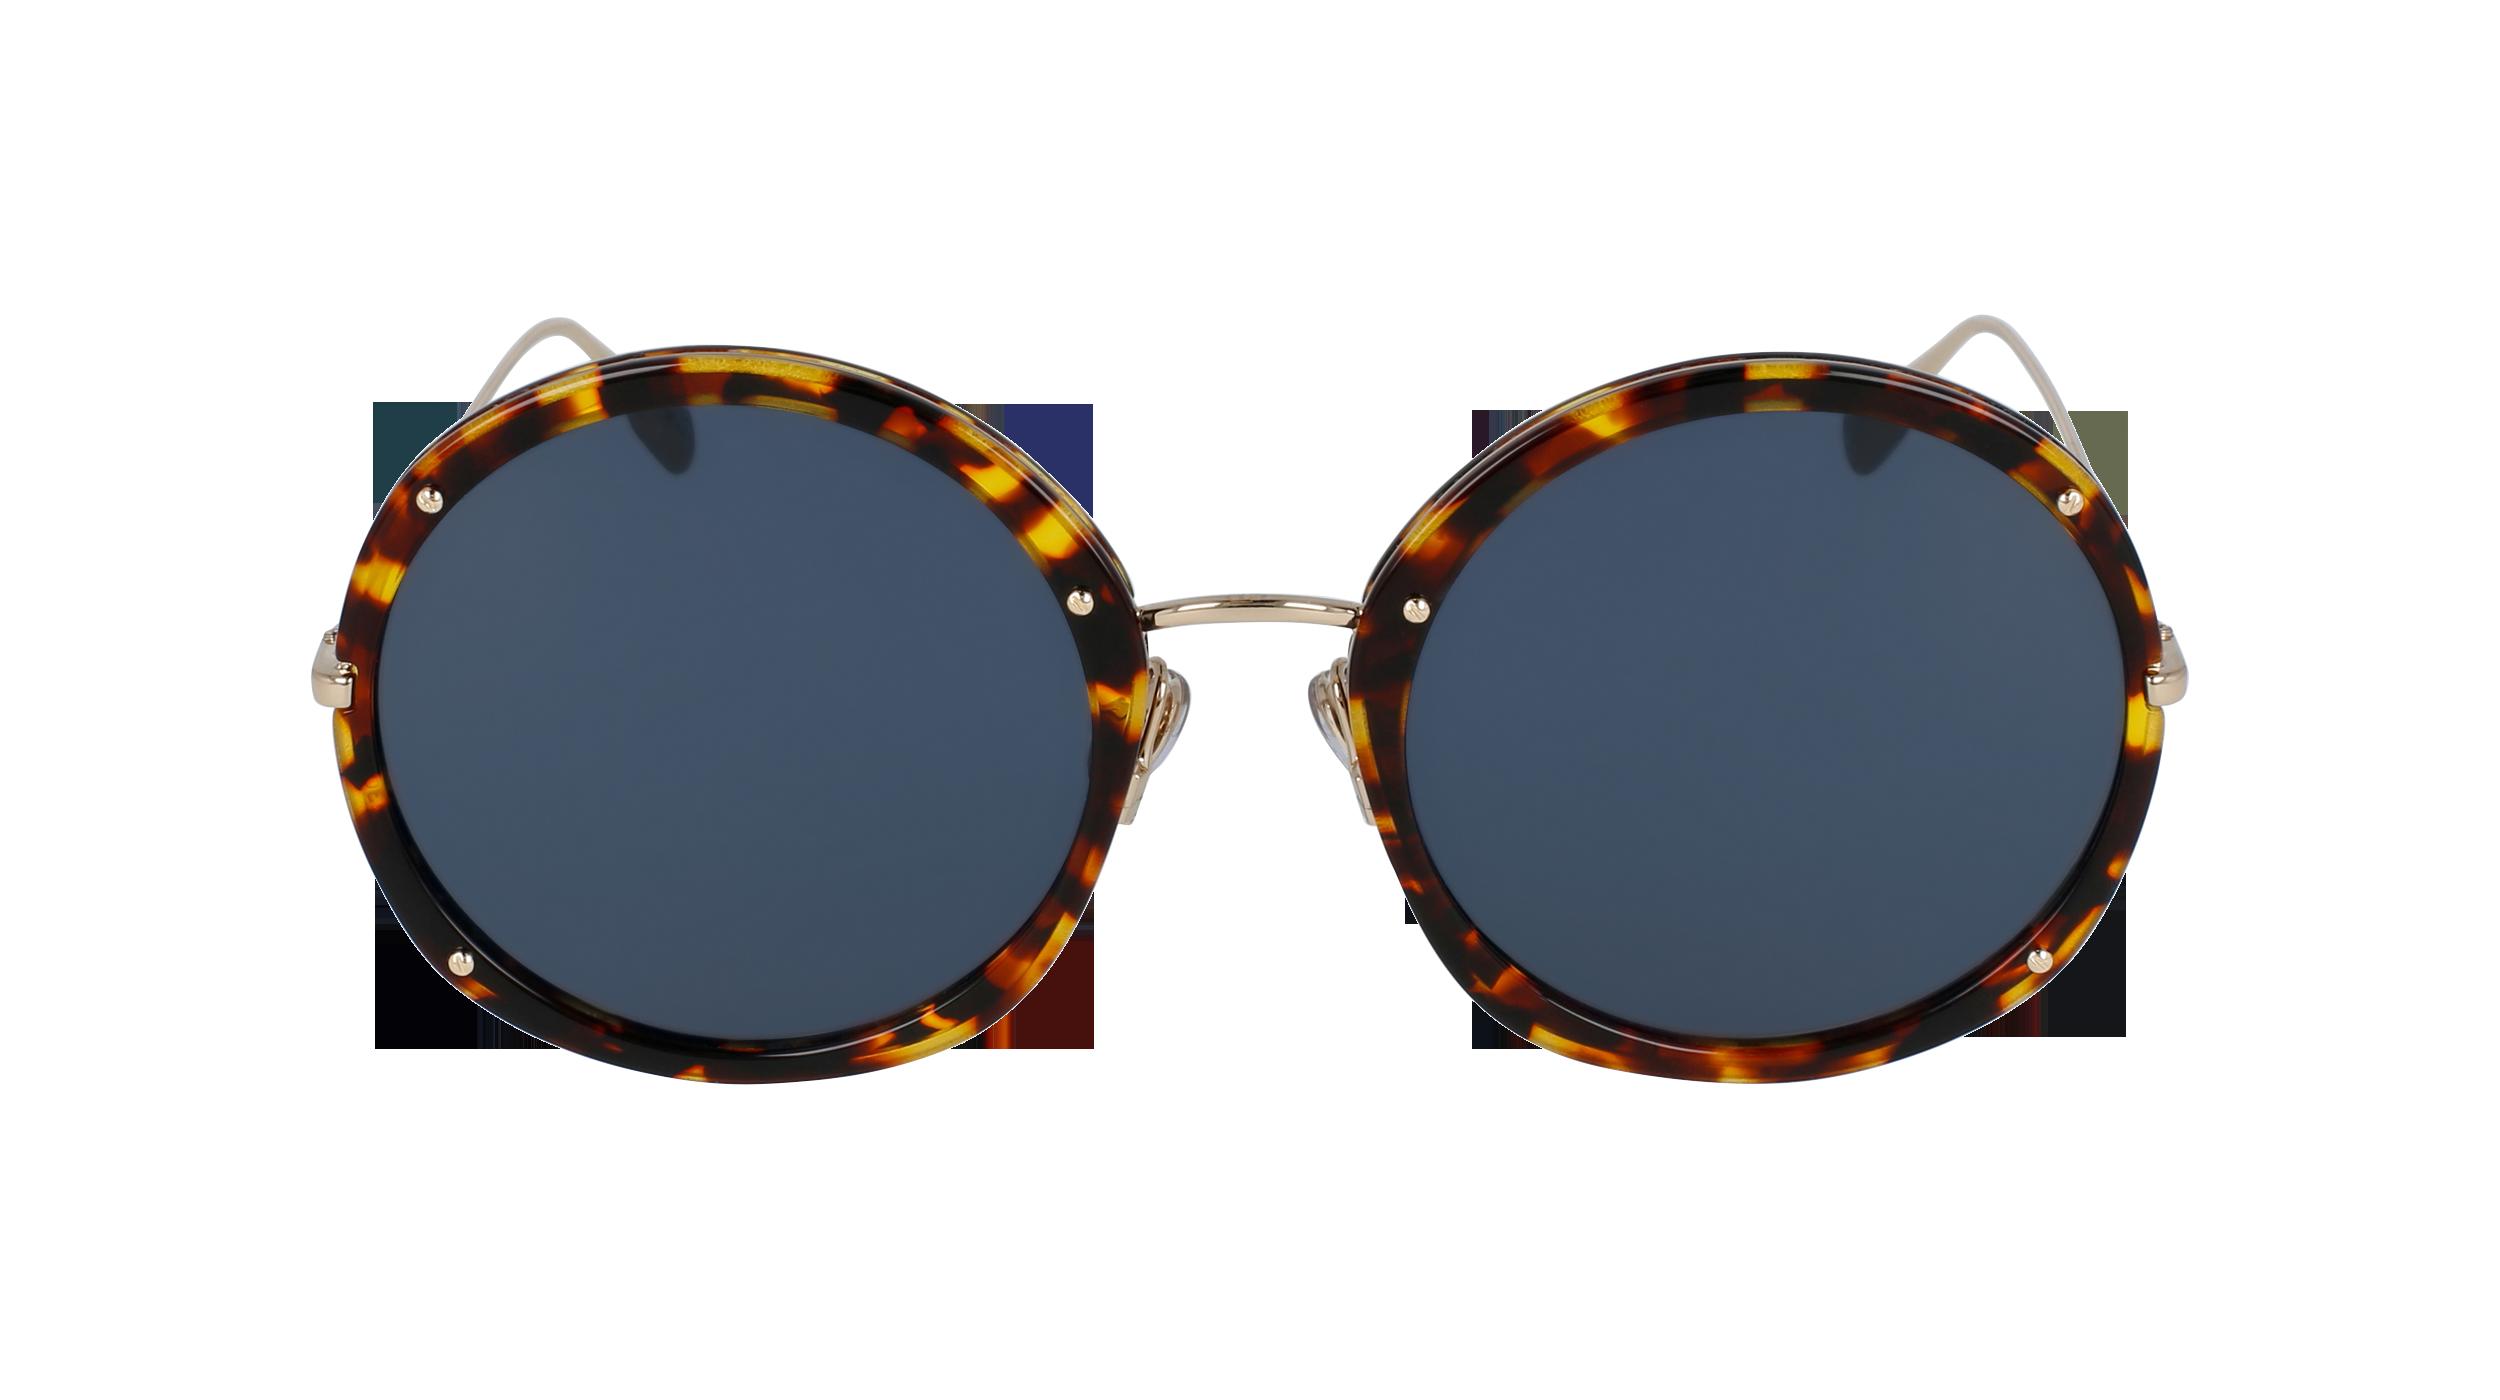 Optic2000 Lunettes Soleil Dior